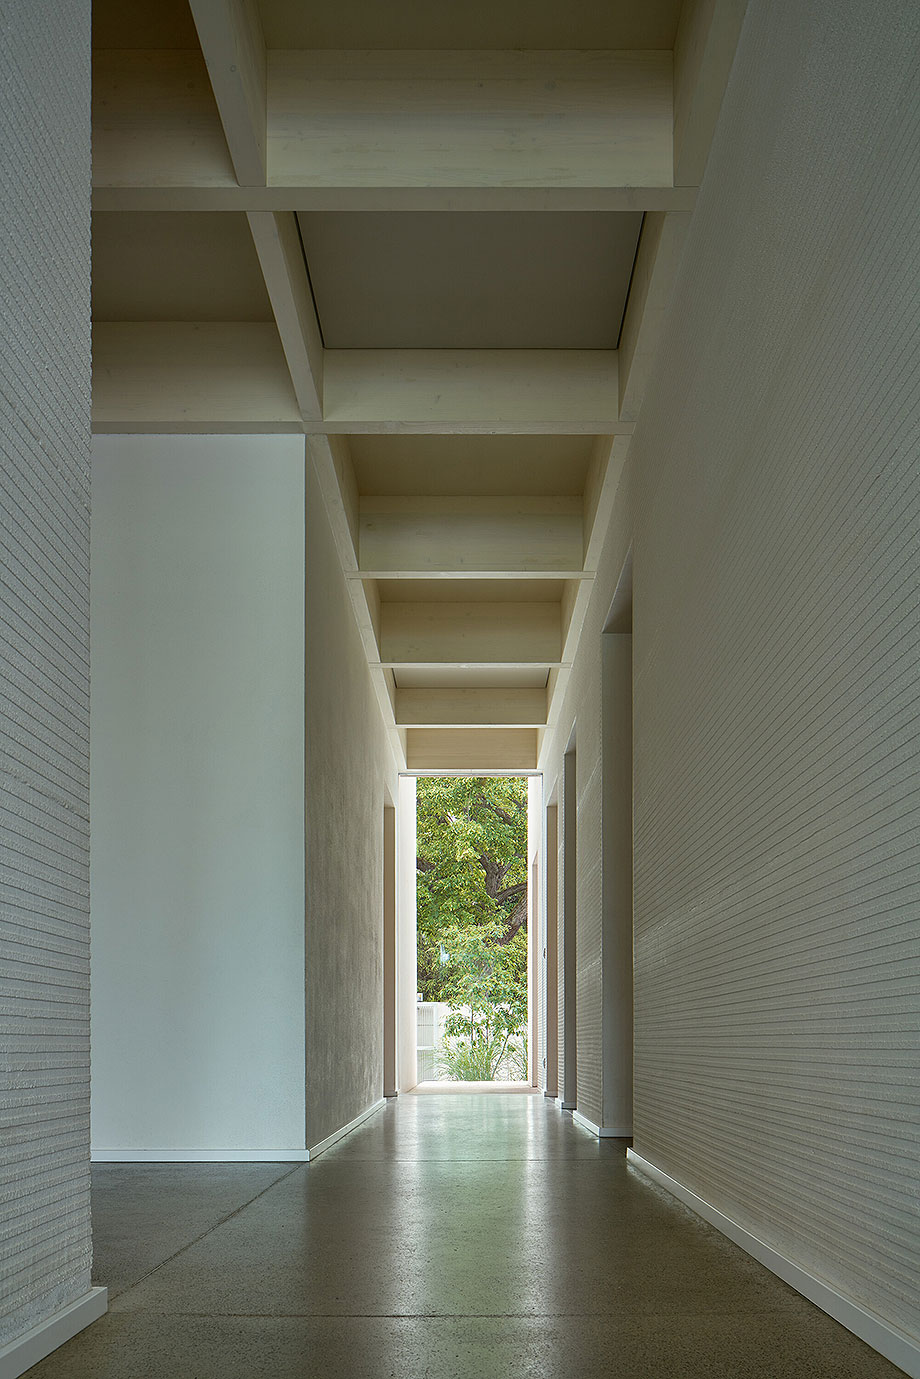 casa lhotka en praga de soa architekti y richter design (15) - foto boysplaynice